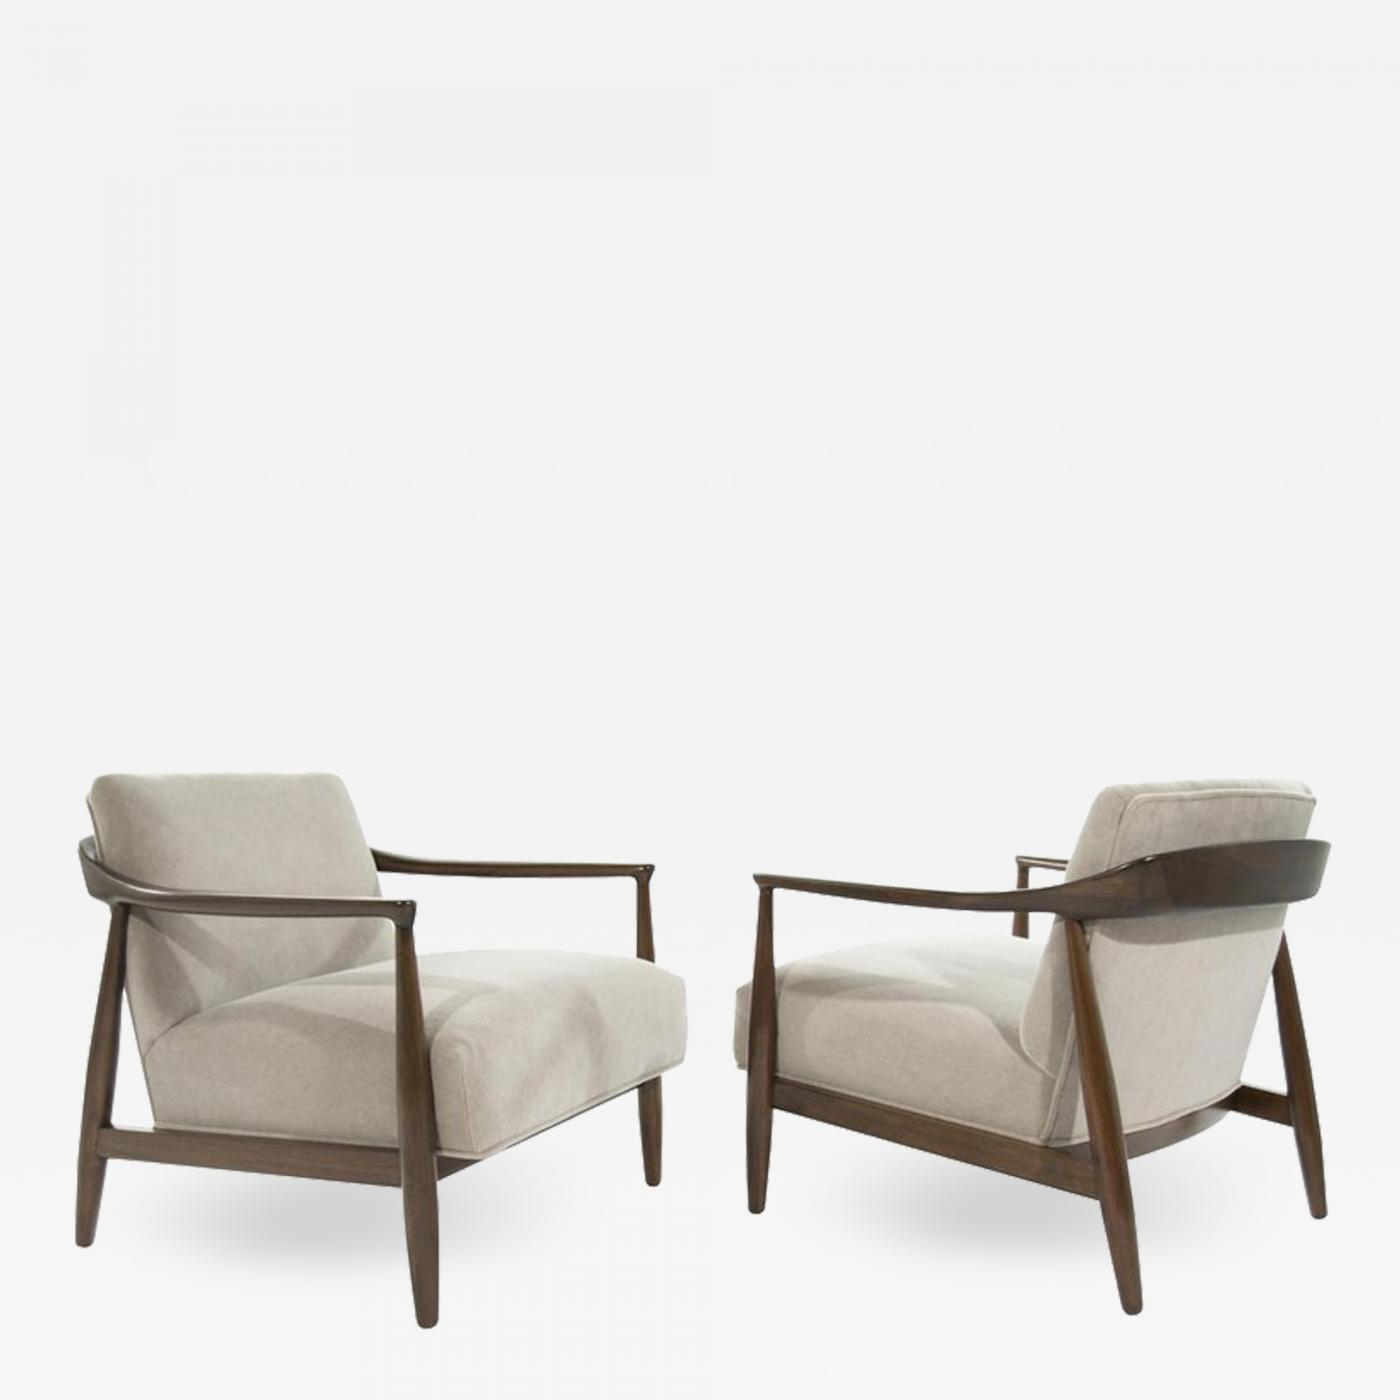 Superb Ib Kofod Larsen Sculptural Danish Modern Lounge Chairs 1950S Inzonedesignstudio Interior Chair Design Inzonedesignstudiocom